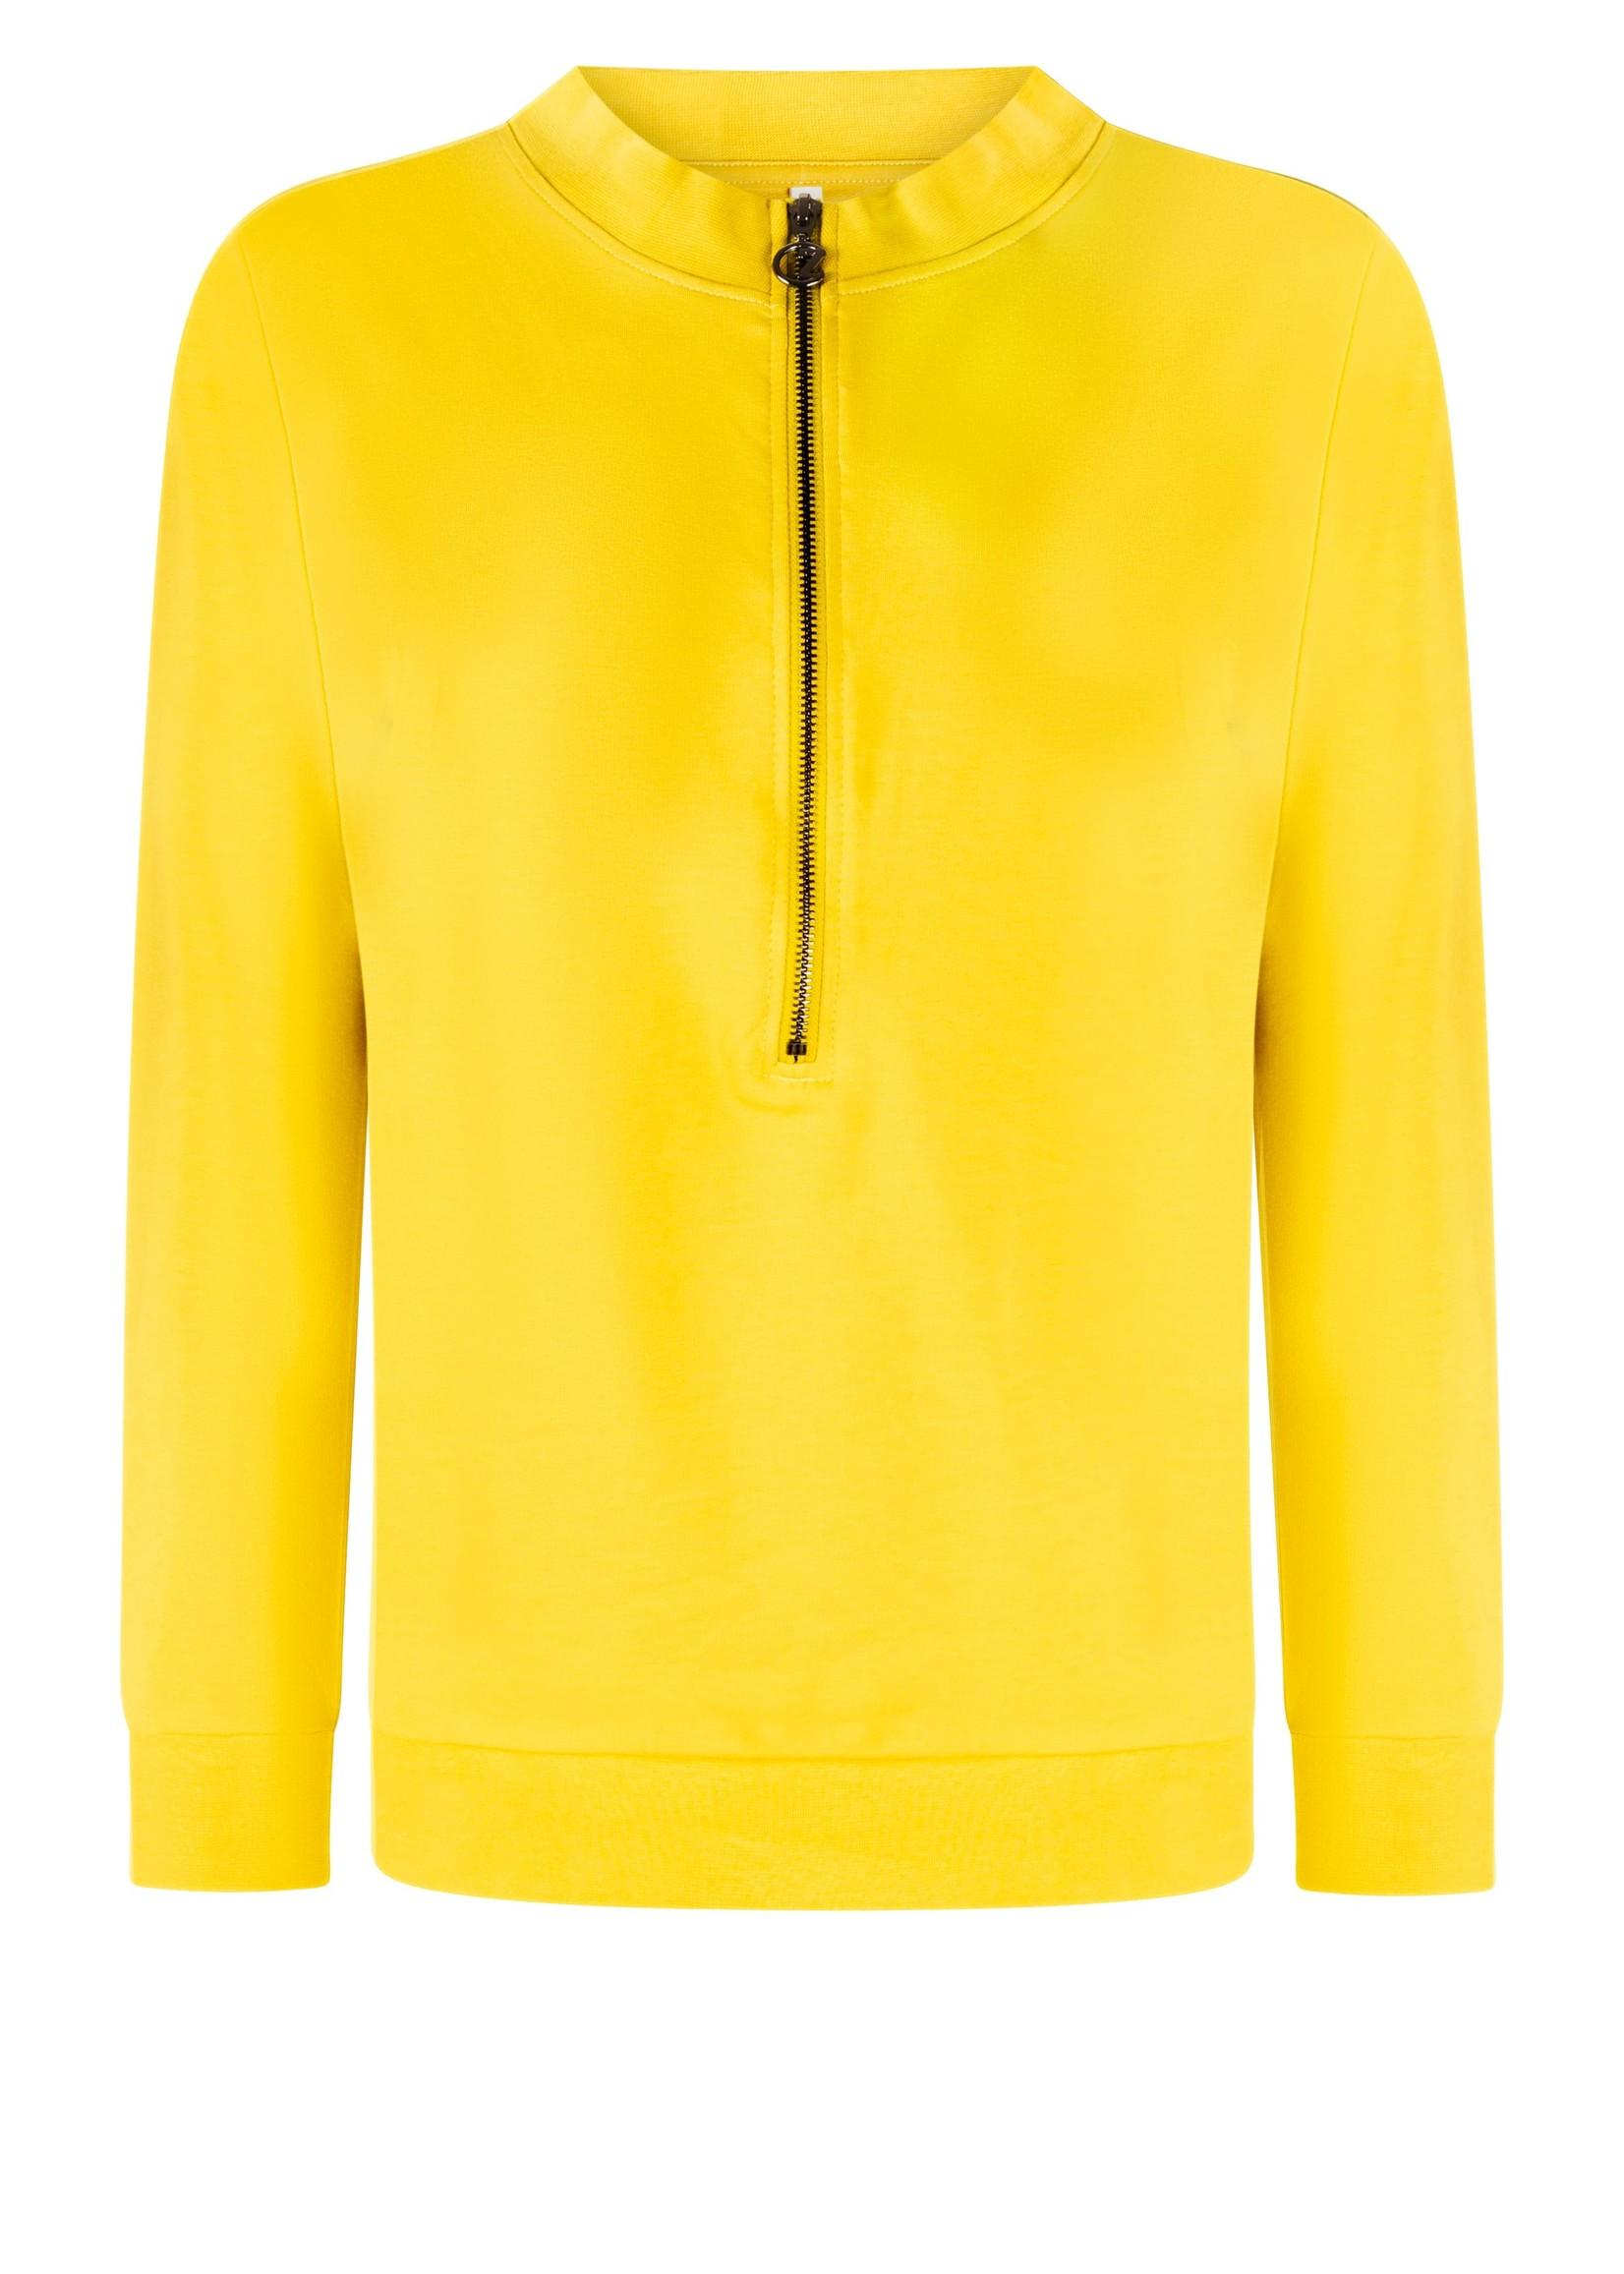 Zoso Zendra Zipper sweater with techprint